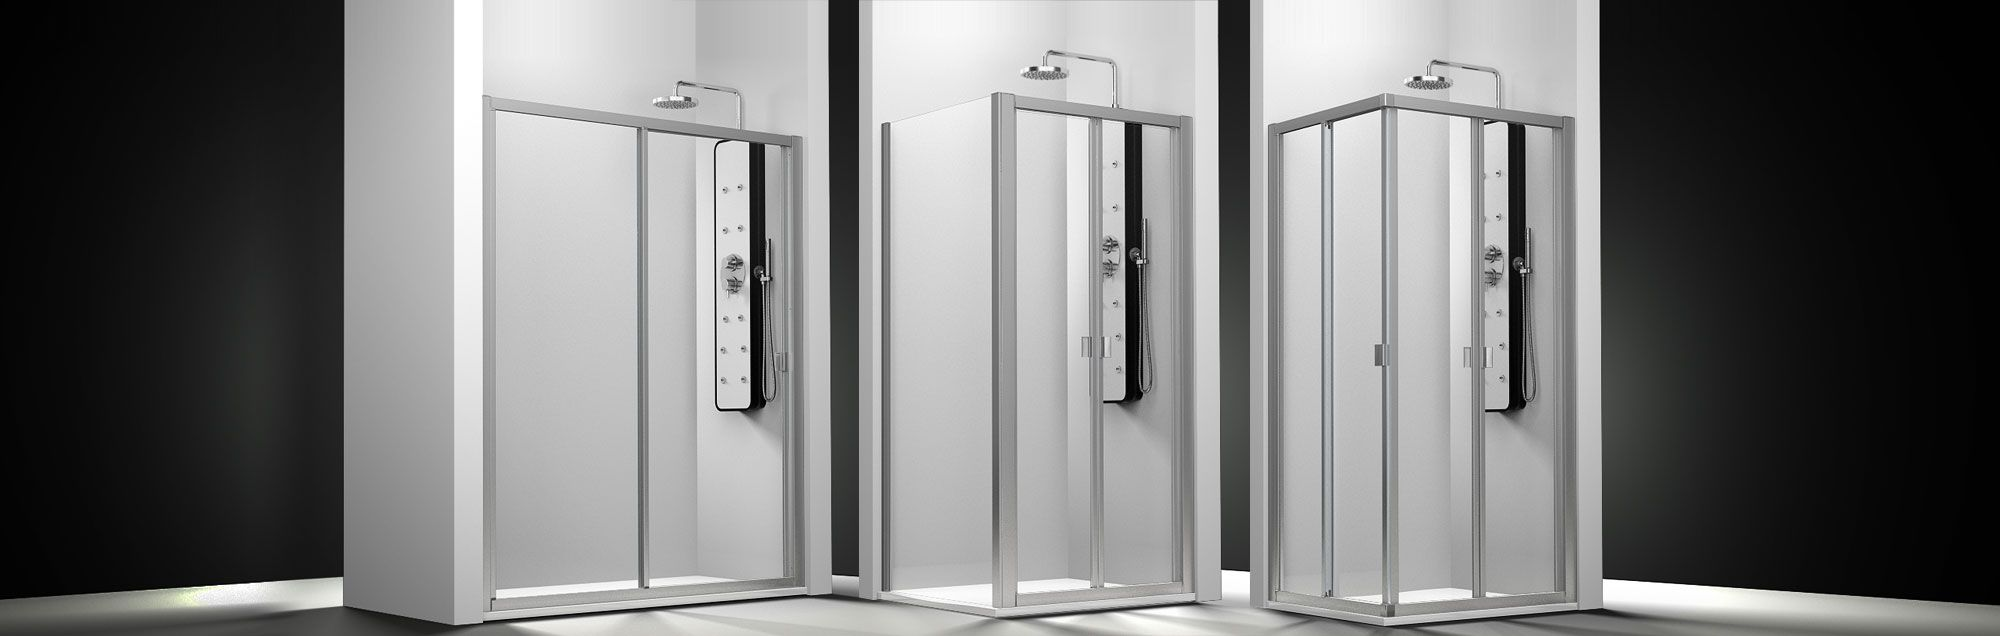 Serie Duna de mamparas plegables de ducha a medida